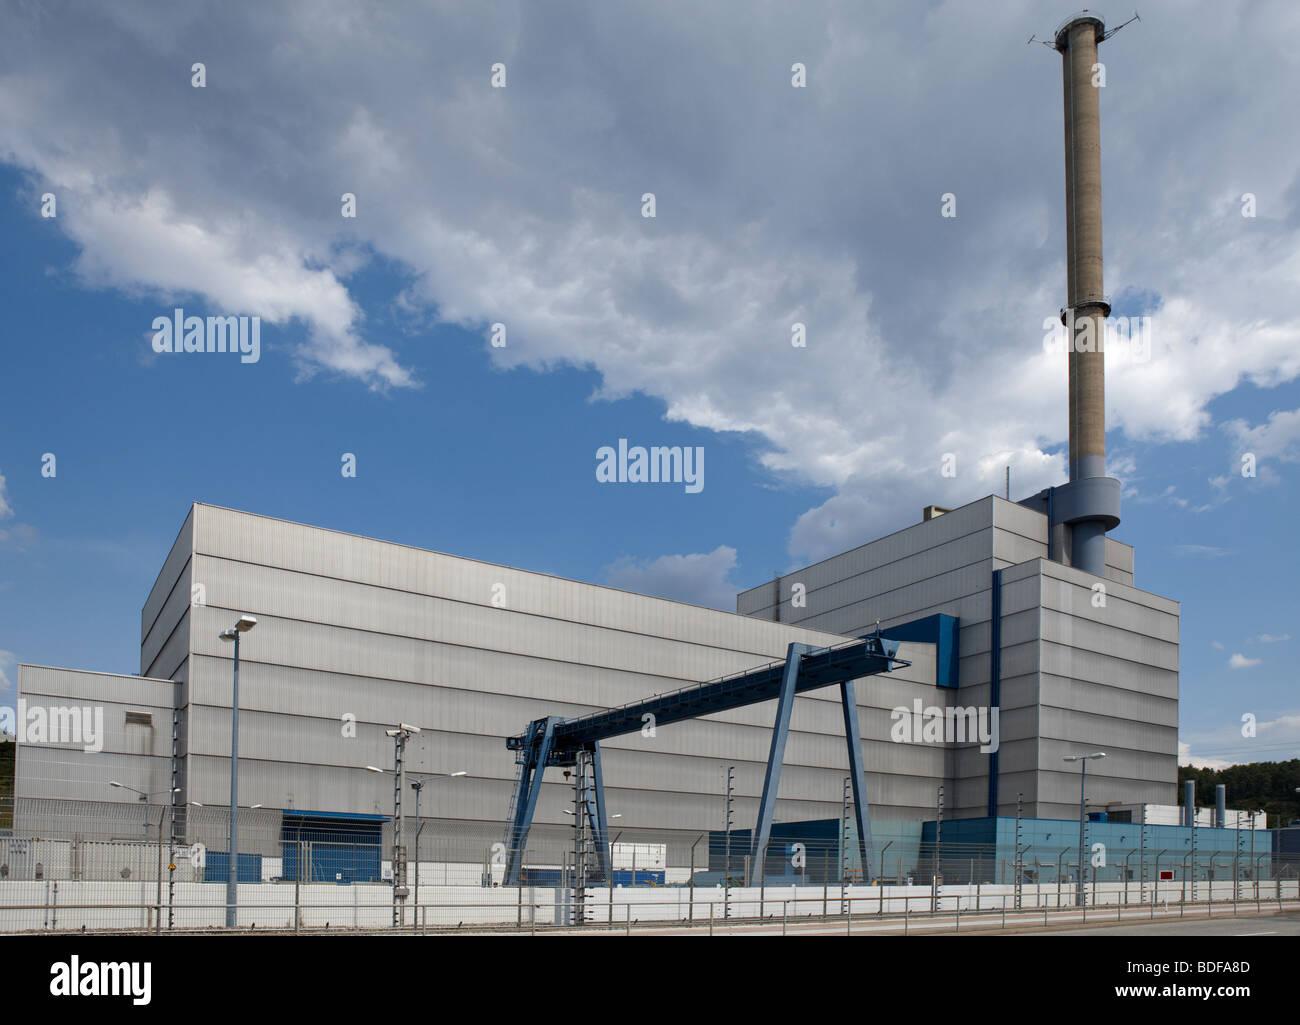 Kernkraftwerk, AKW Kruemmel, Deutschland, Germany, Nuclear - Stock Image